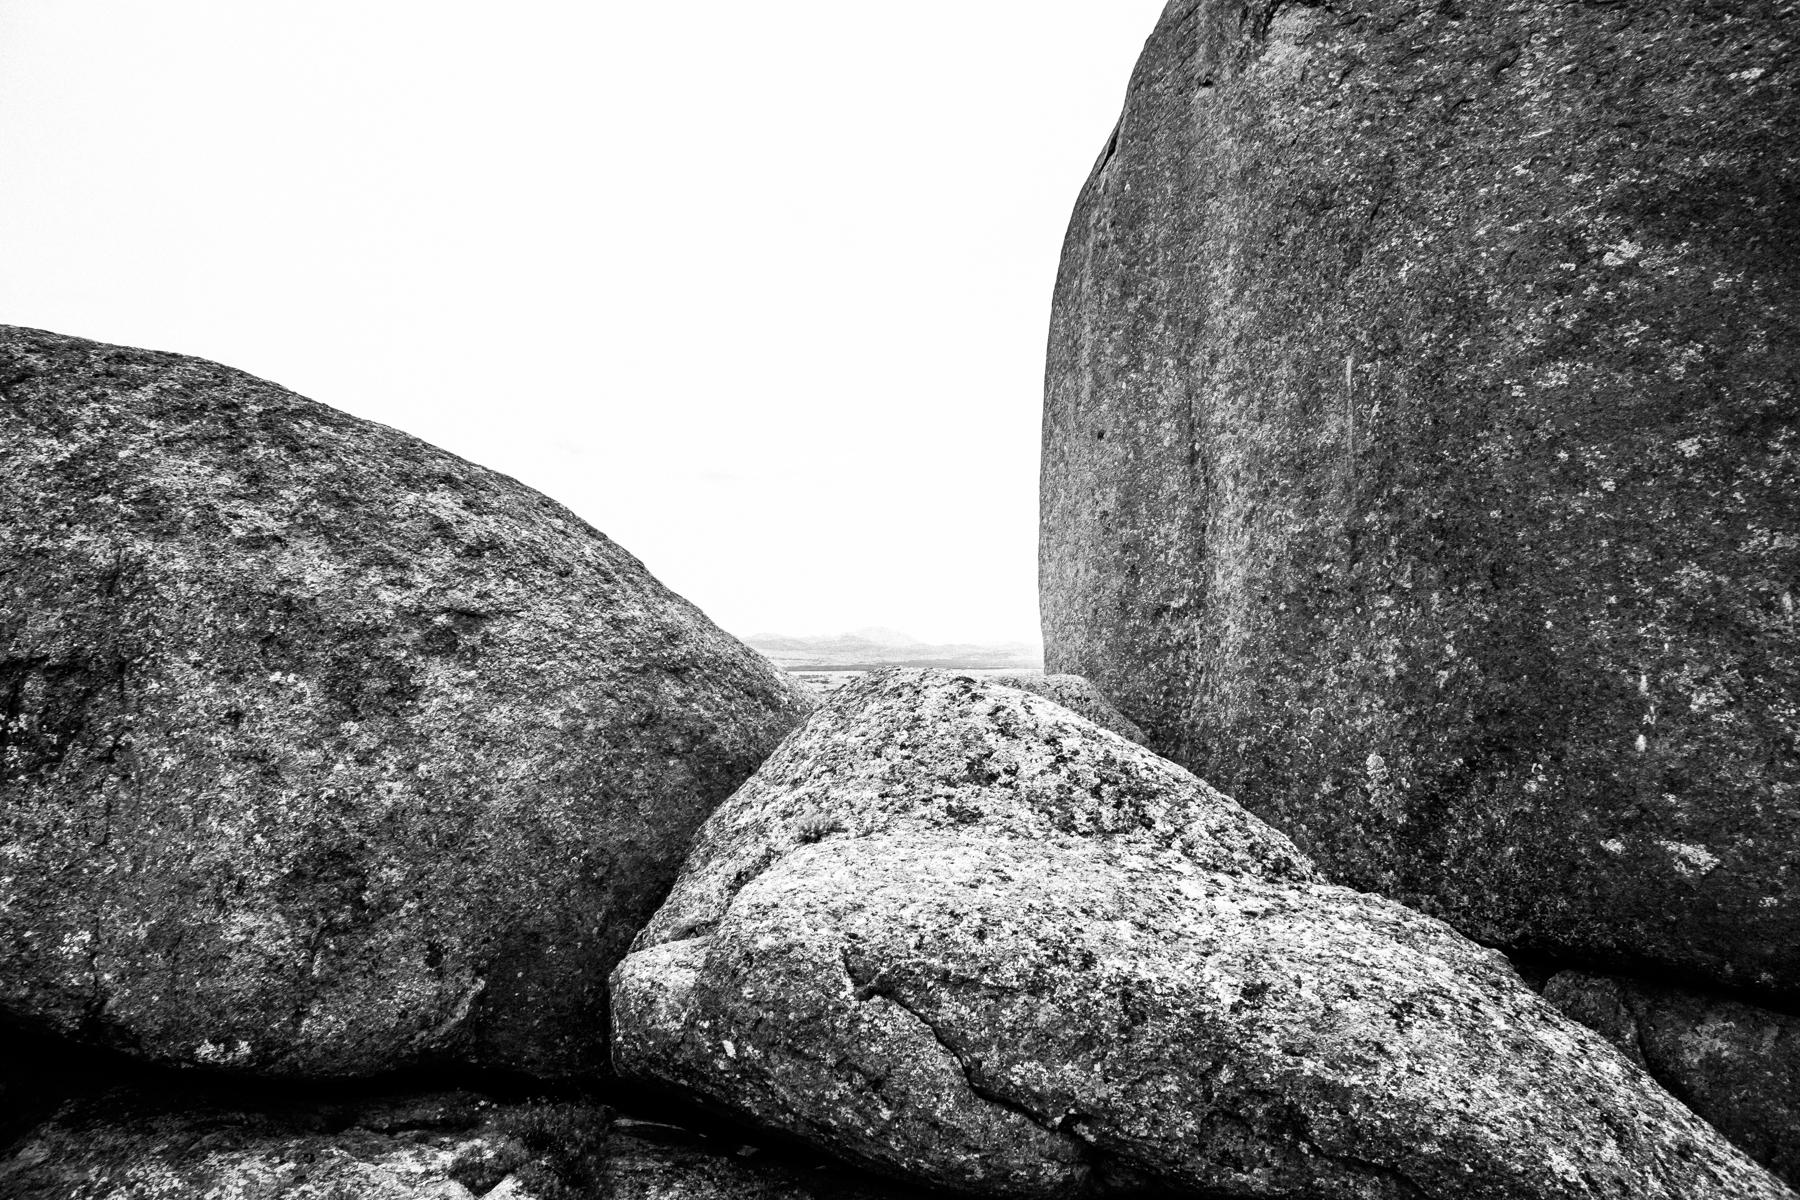 2017-06-25 Mount Lincoln B (16 of 20).jpg